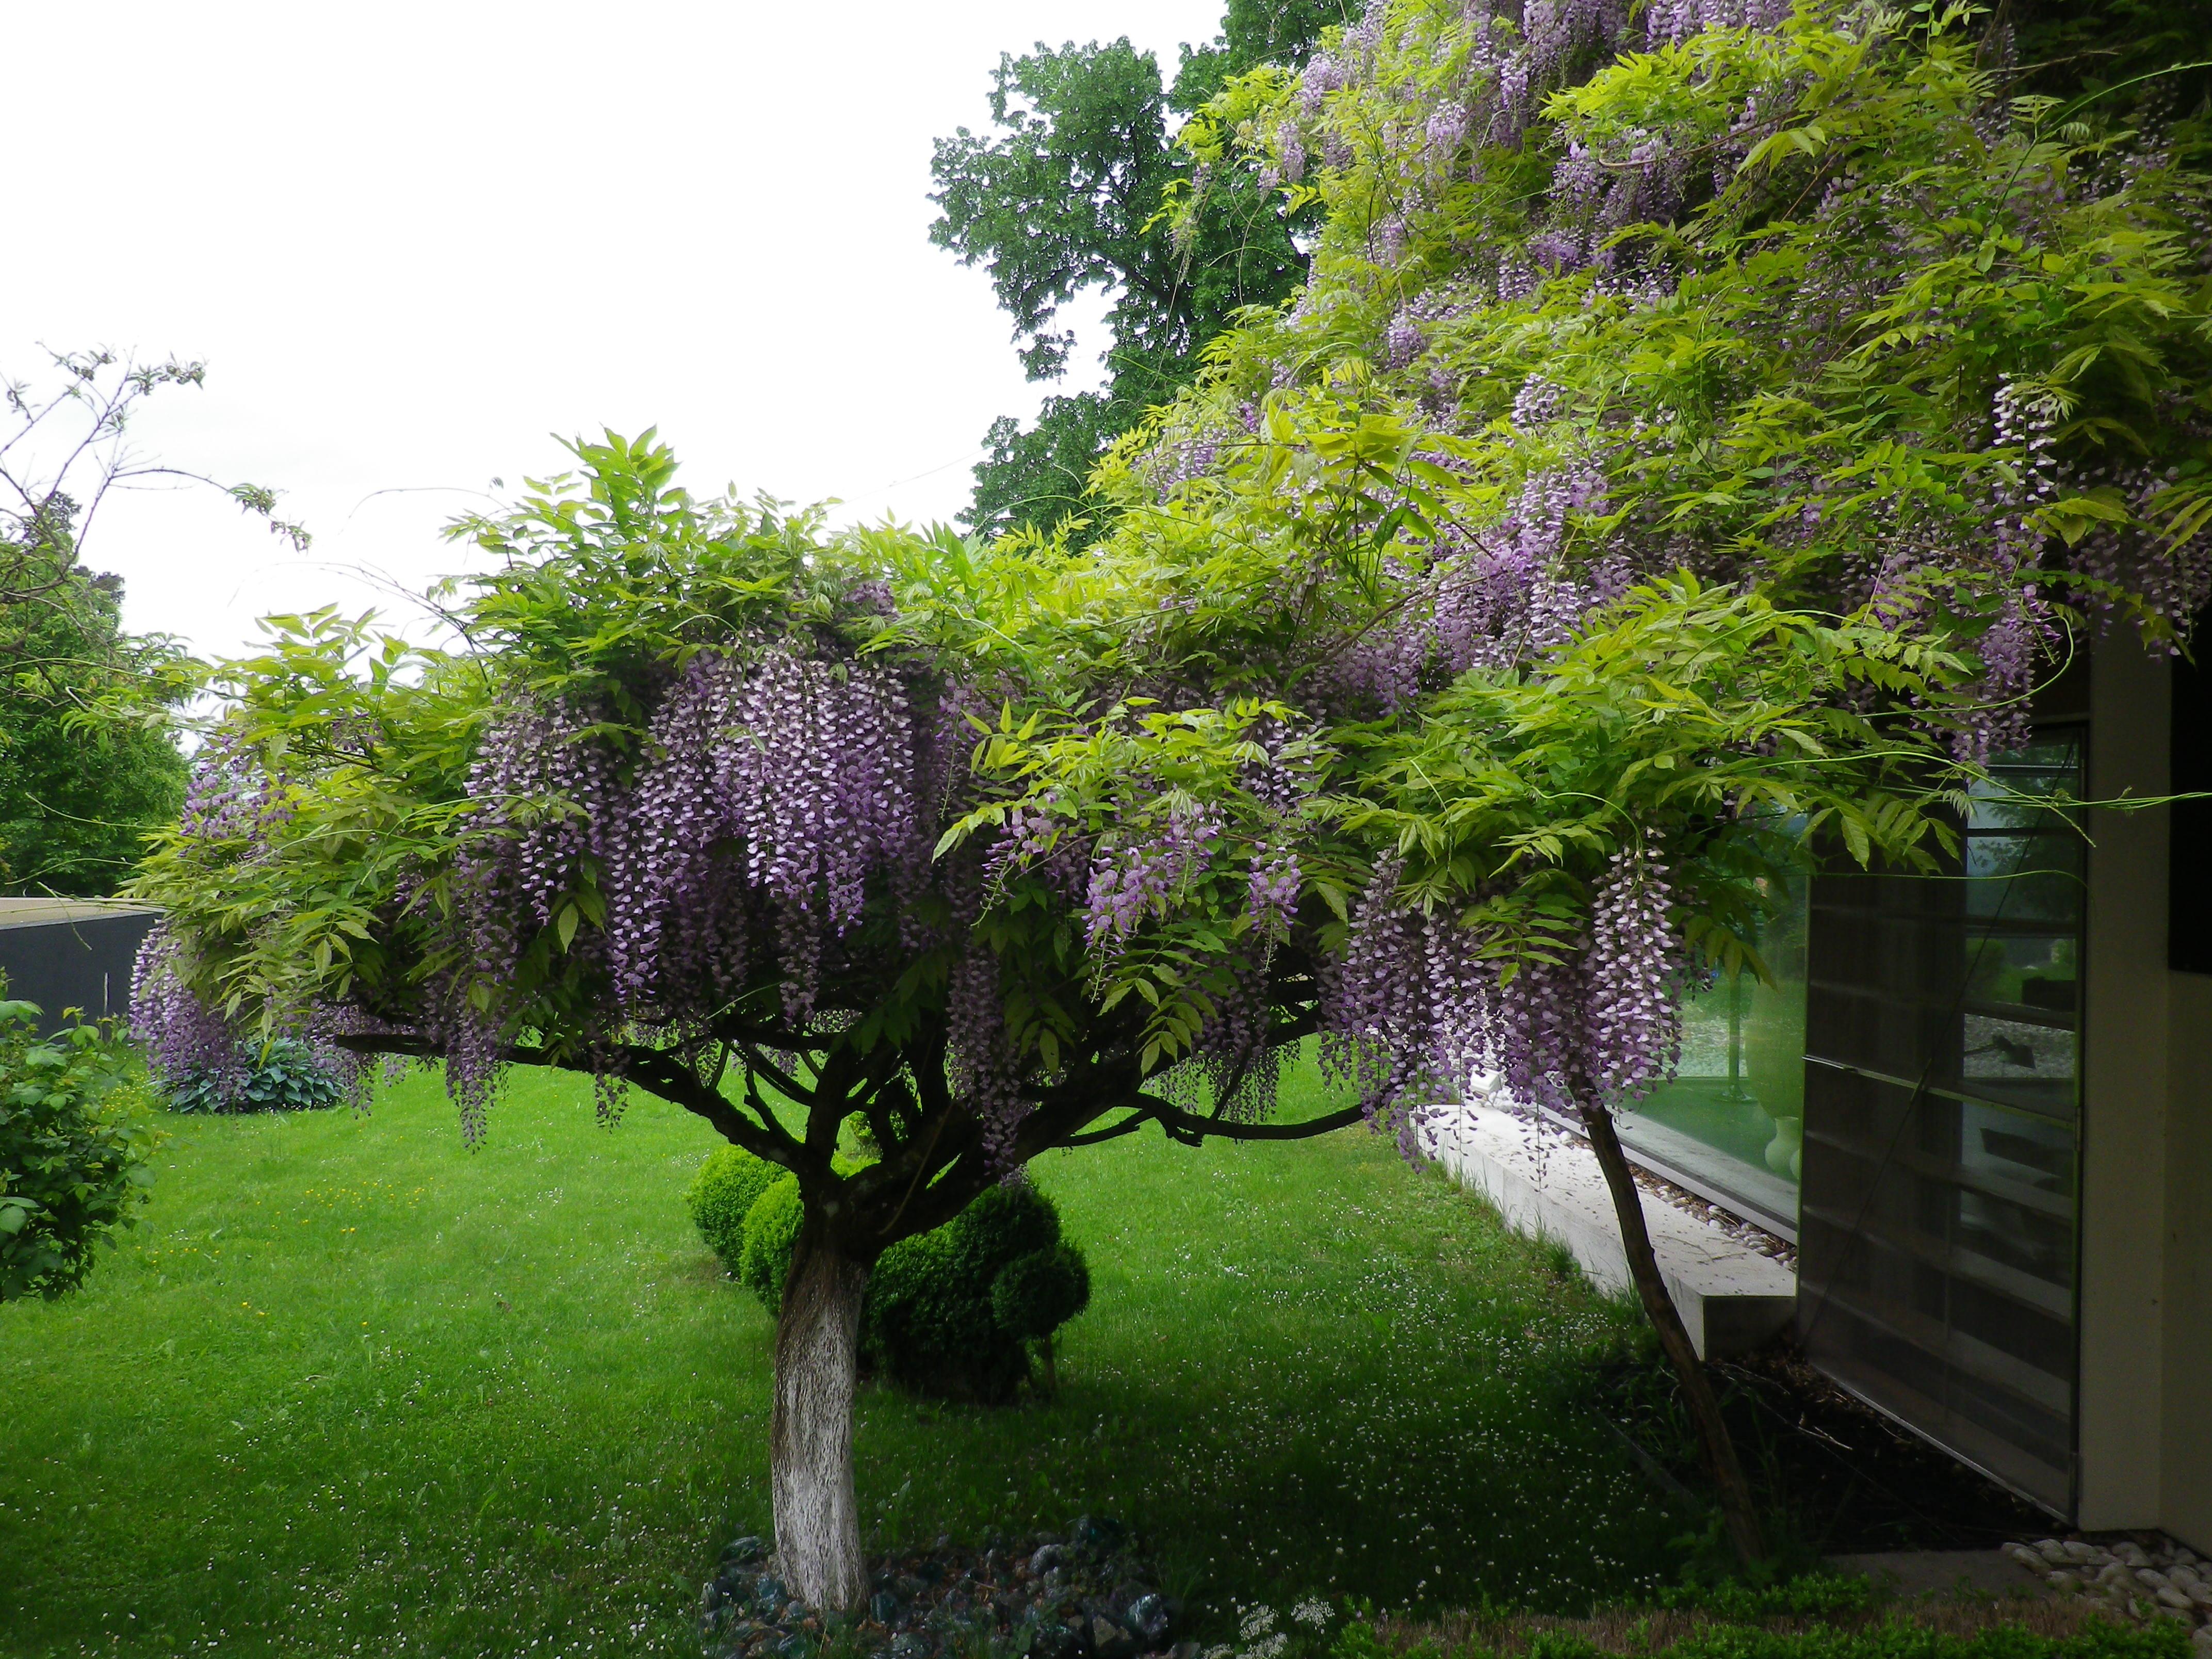 Pflanzen eolas gartengestaltung for Gartengestaltung pflanzen